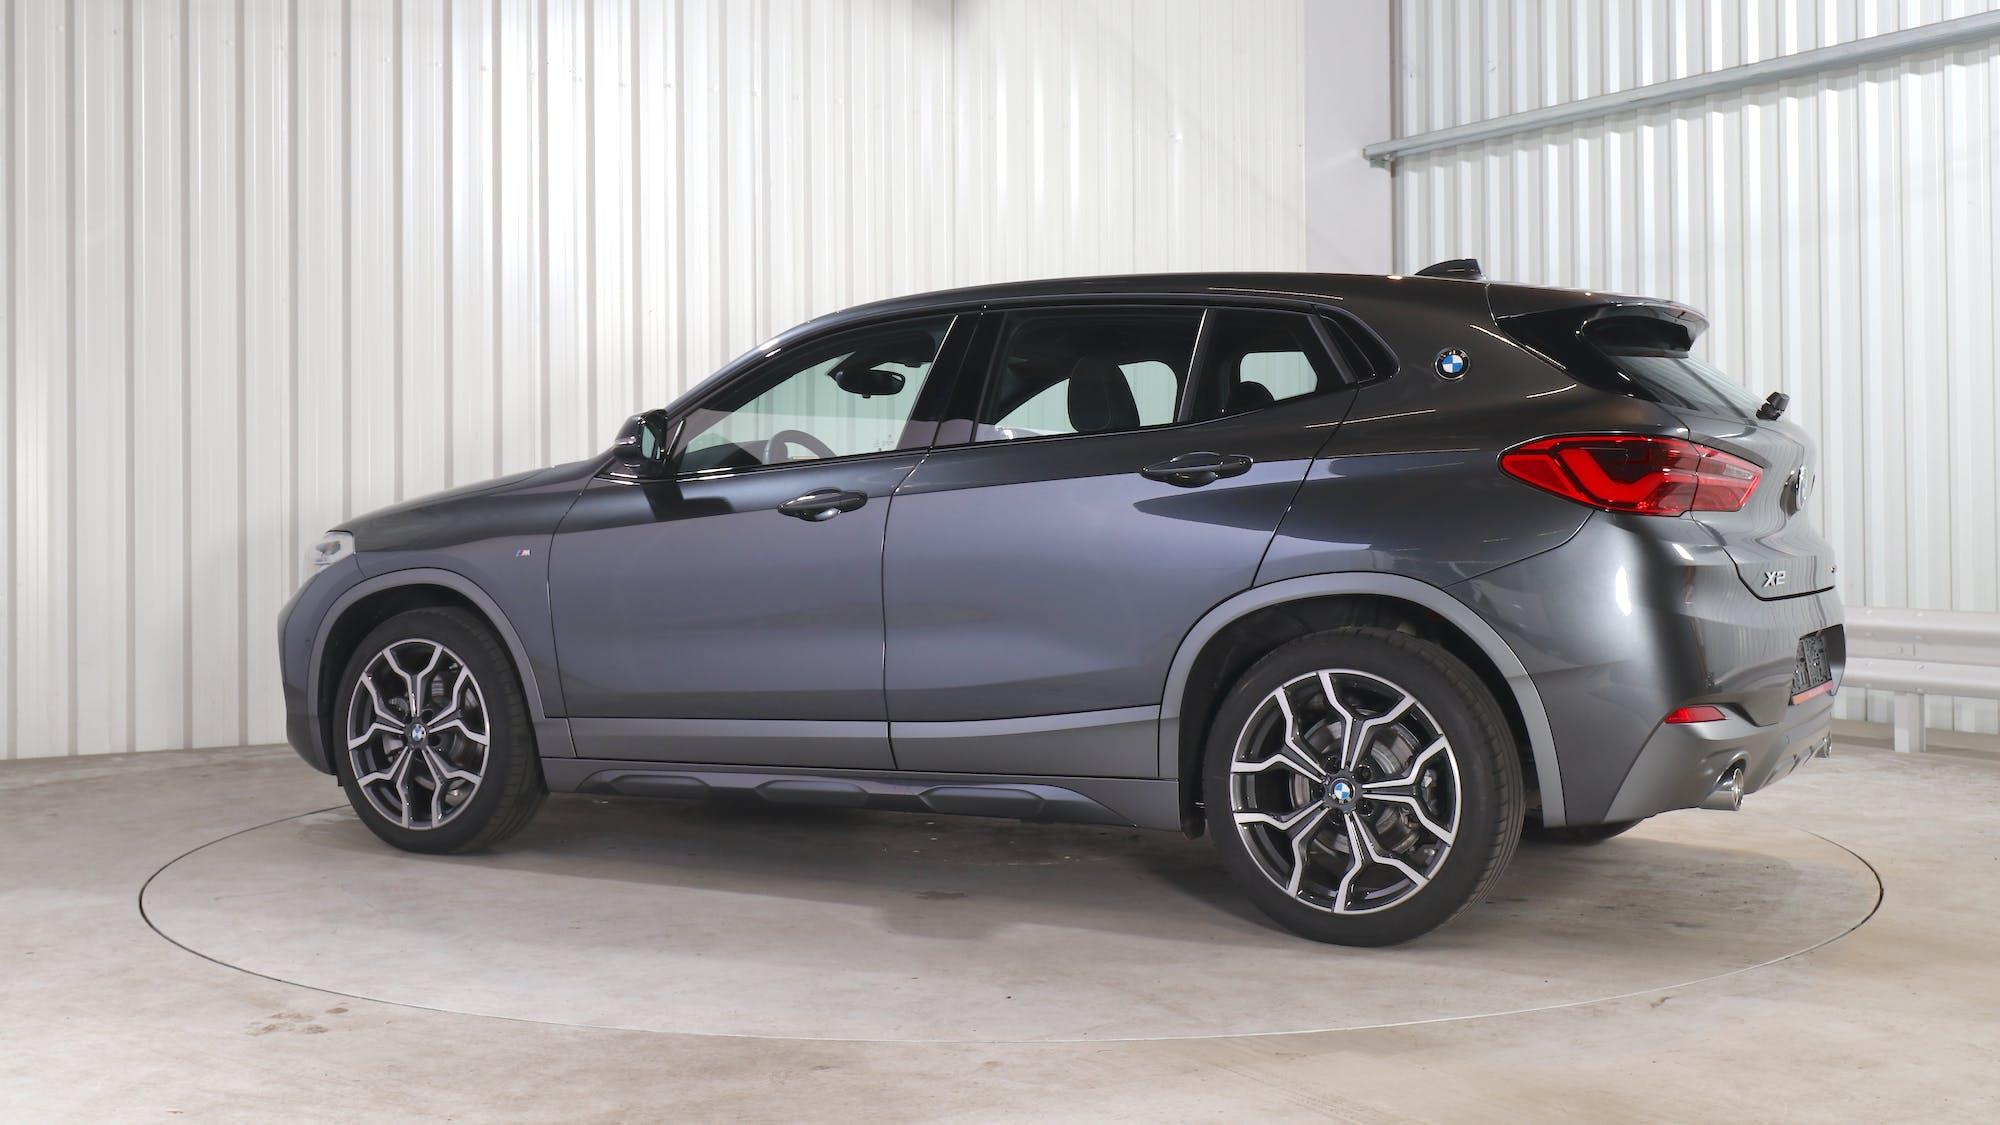 BMW X2 (F39) leasing exterior 3